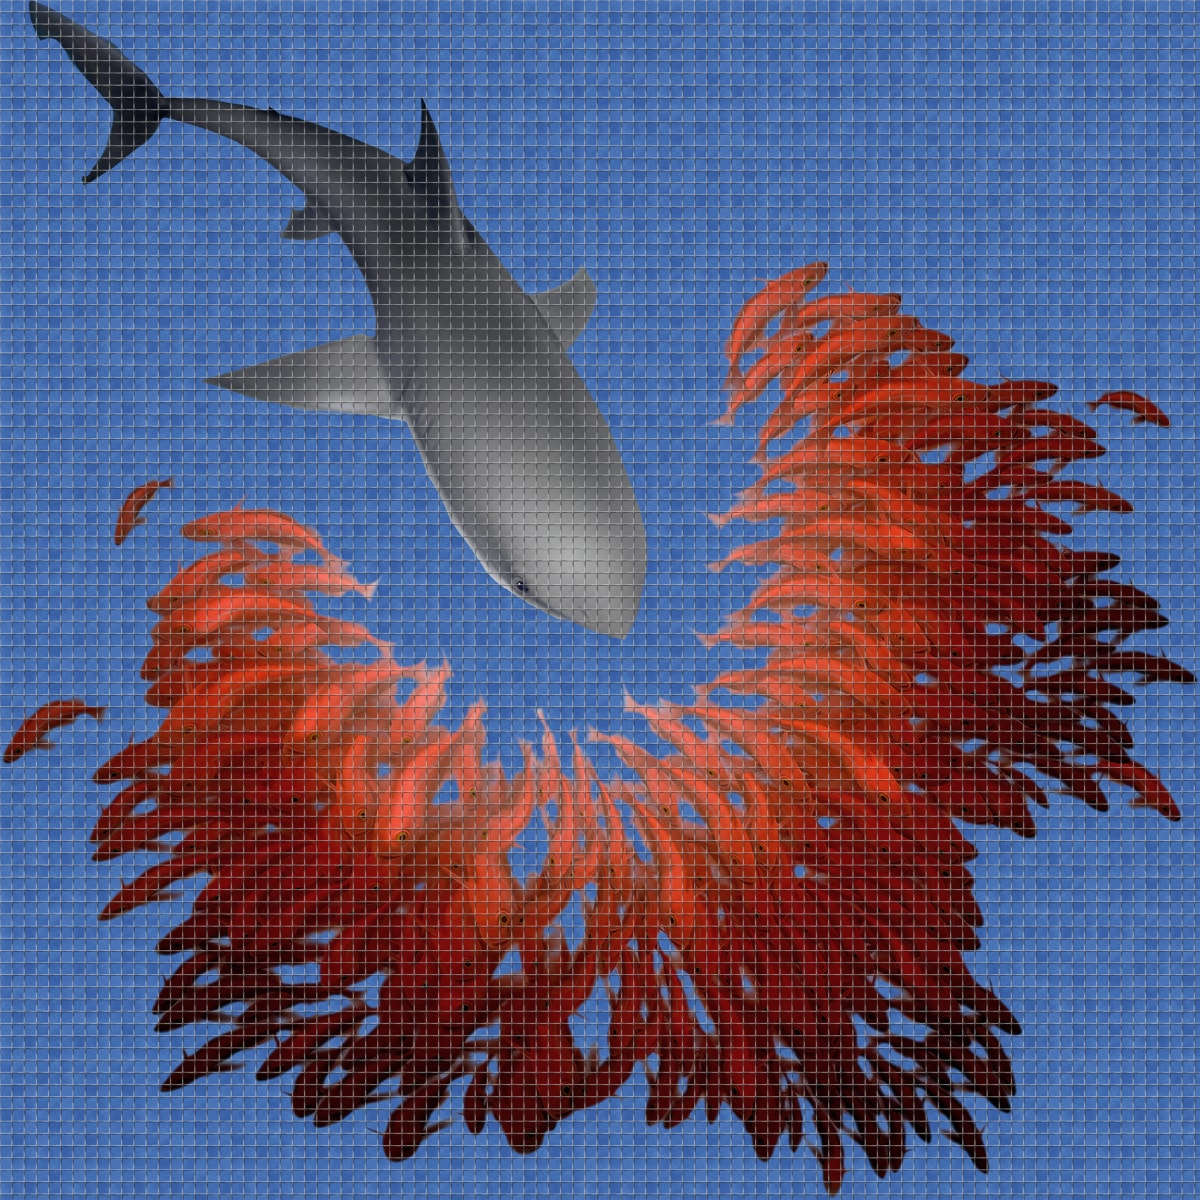 Shark-Digital-Print-Mosaic-Ezarri.jpg